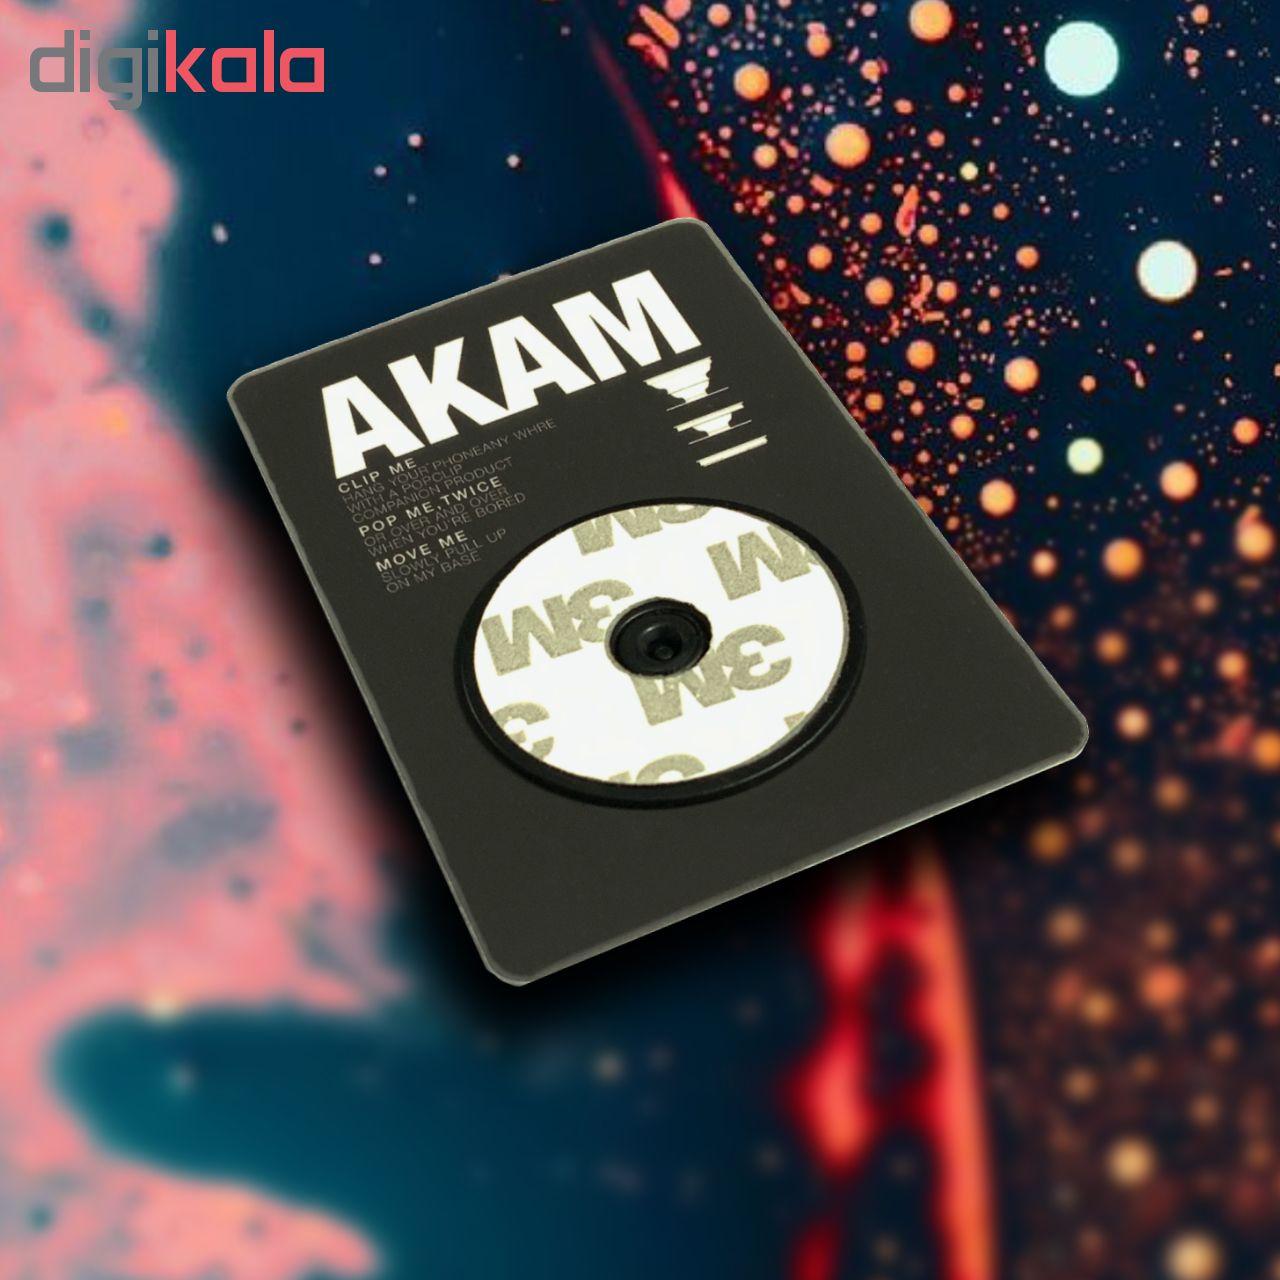 پایه نگهدارنده گوشی موبایل پاپ سوکت آکام مدل APS0101 main 1 2